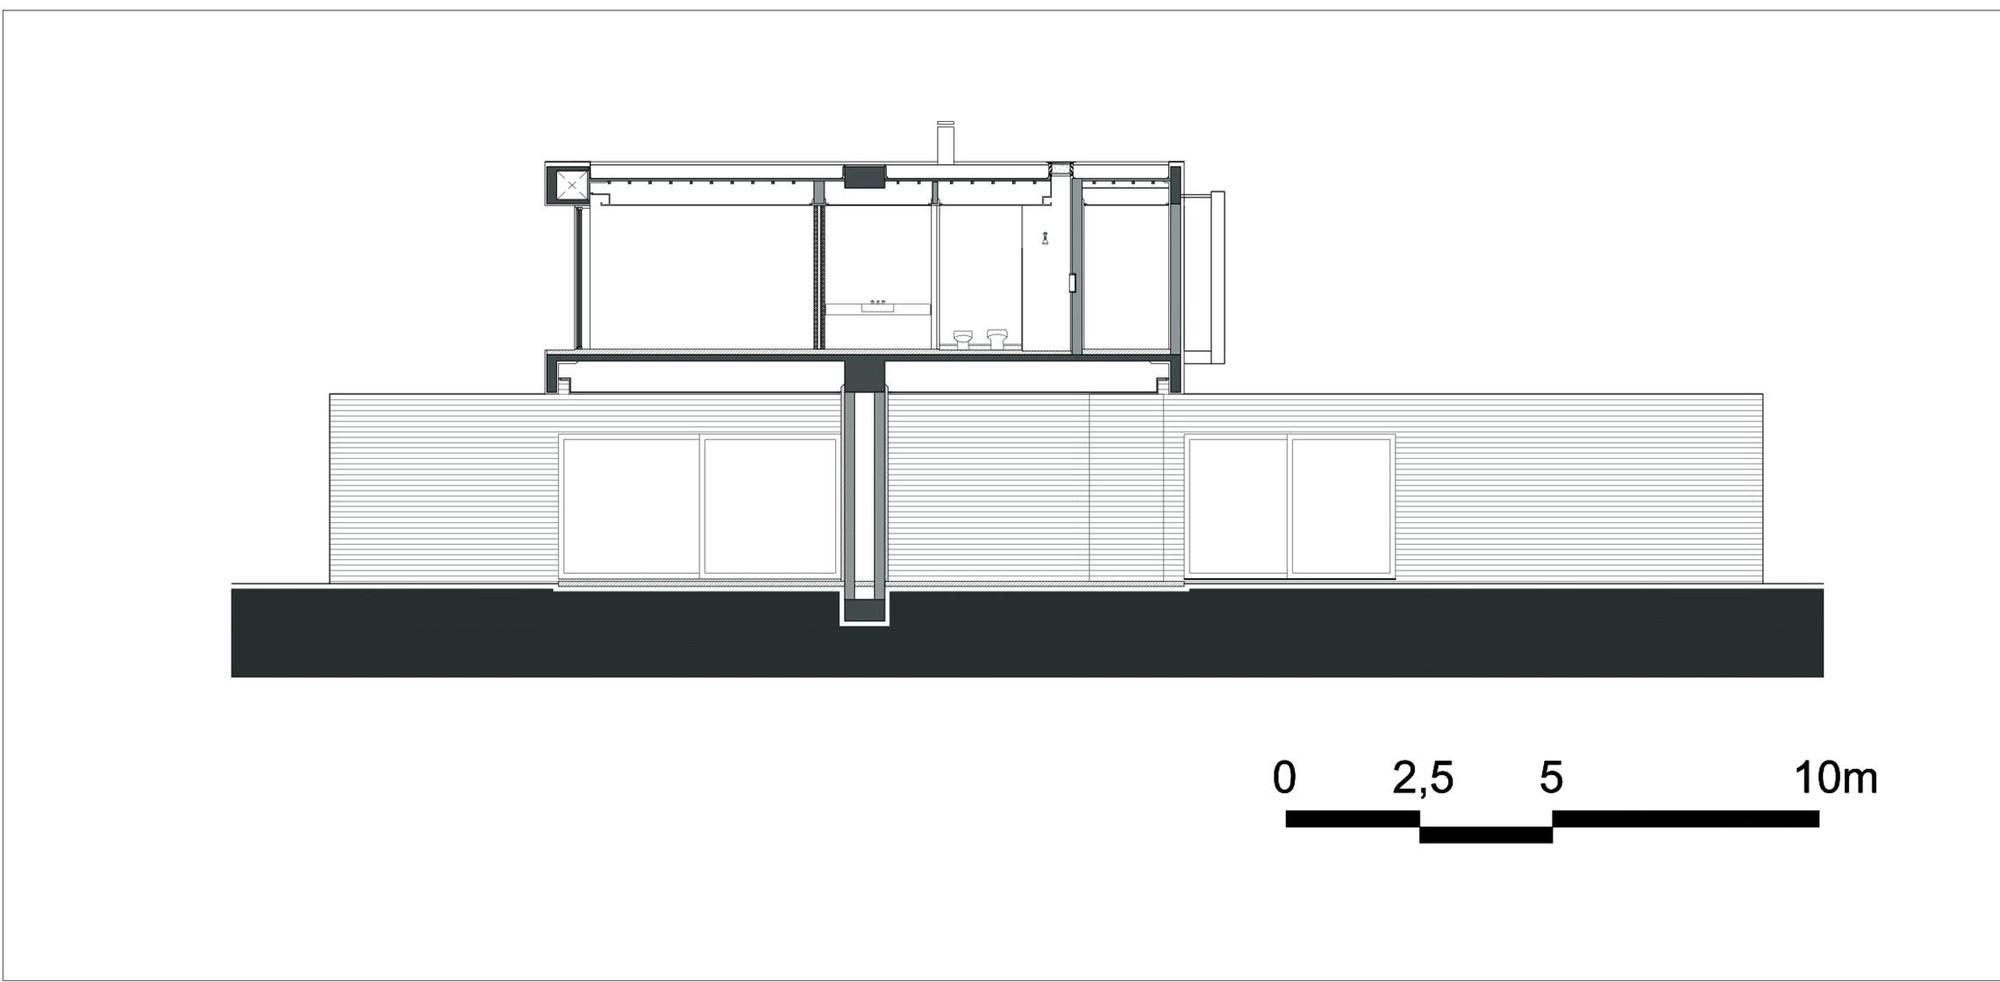 Section CC